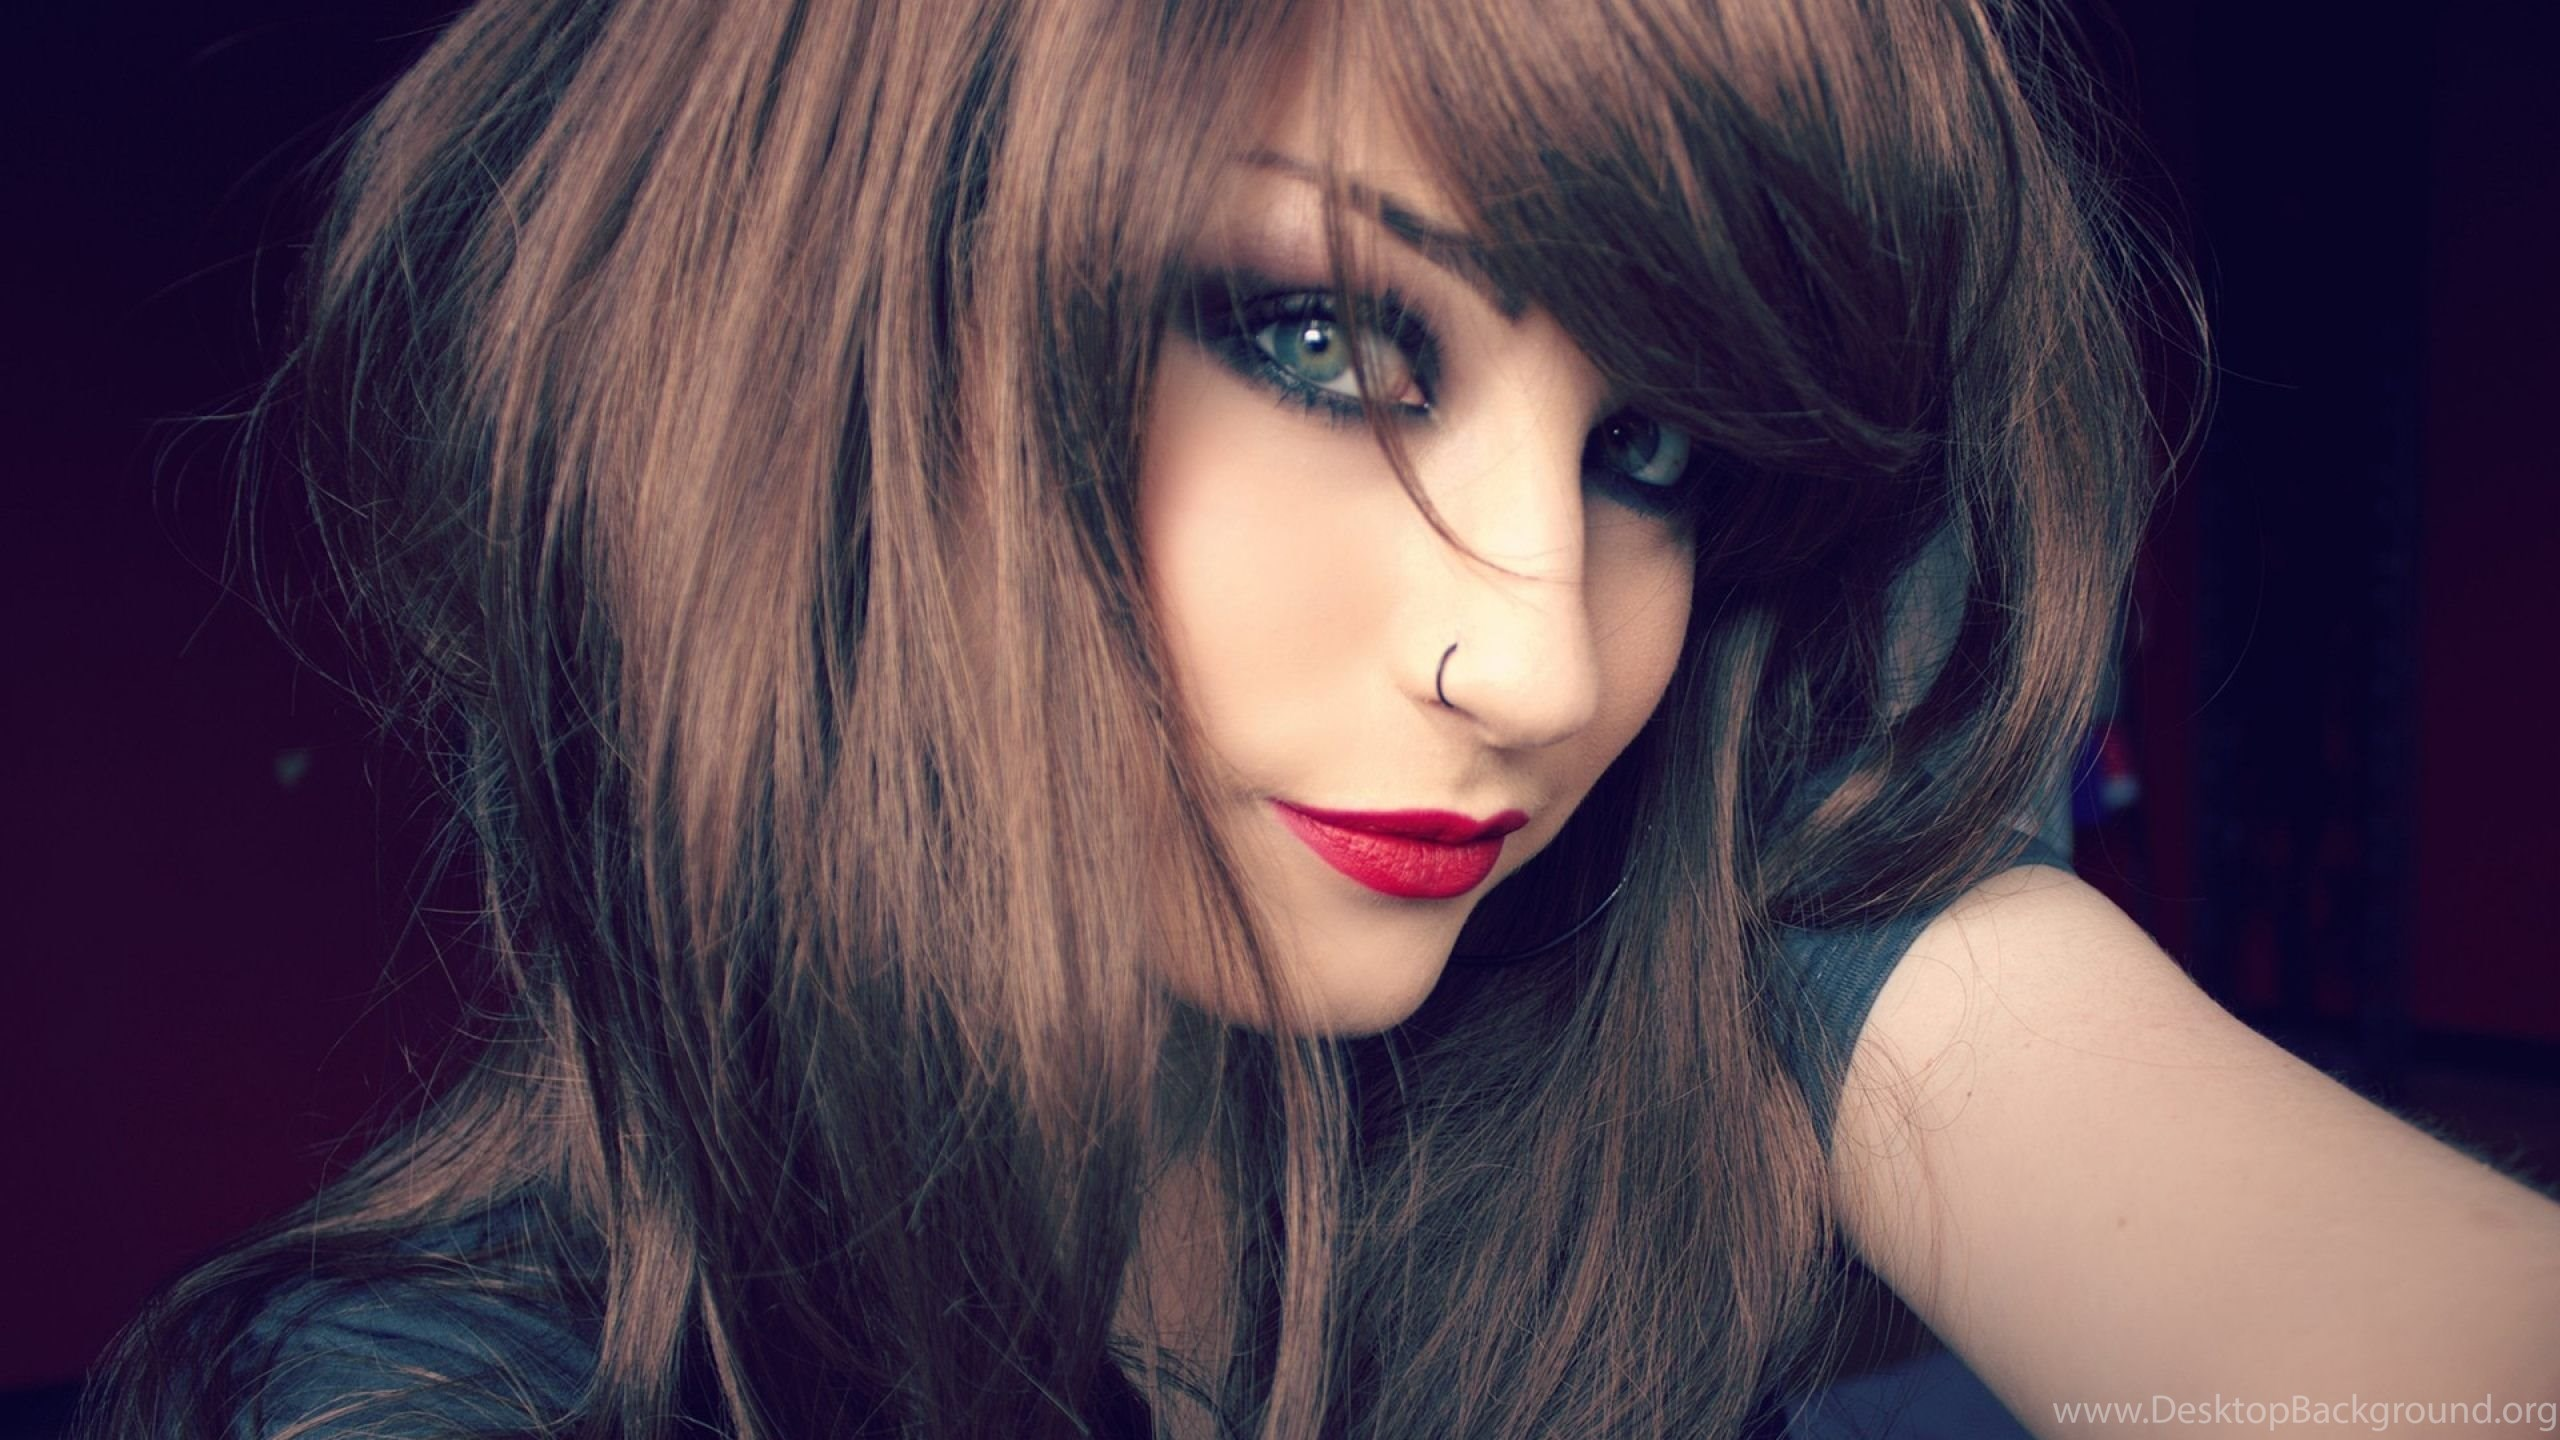 eyes makeup of beautiful girl wallpapers hd high definition desktop